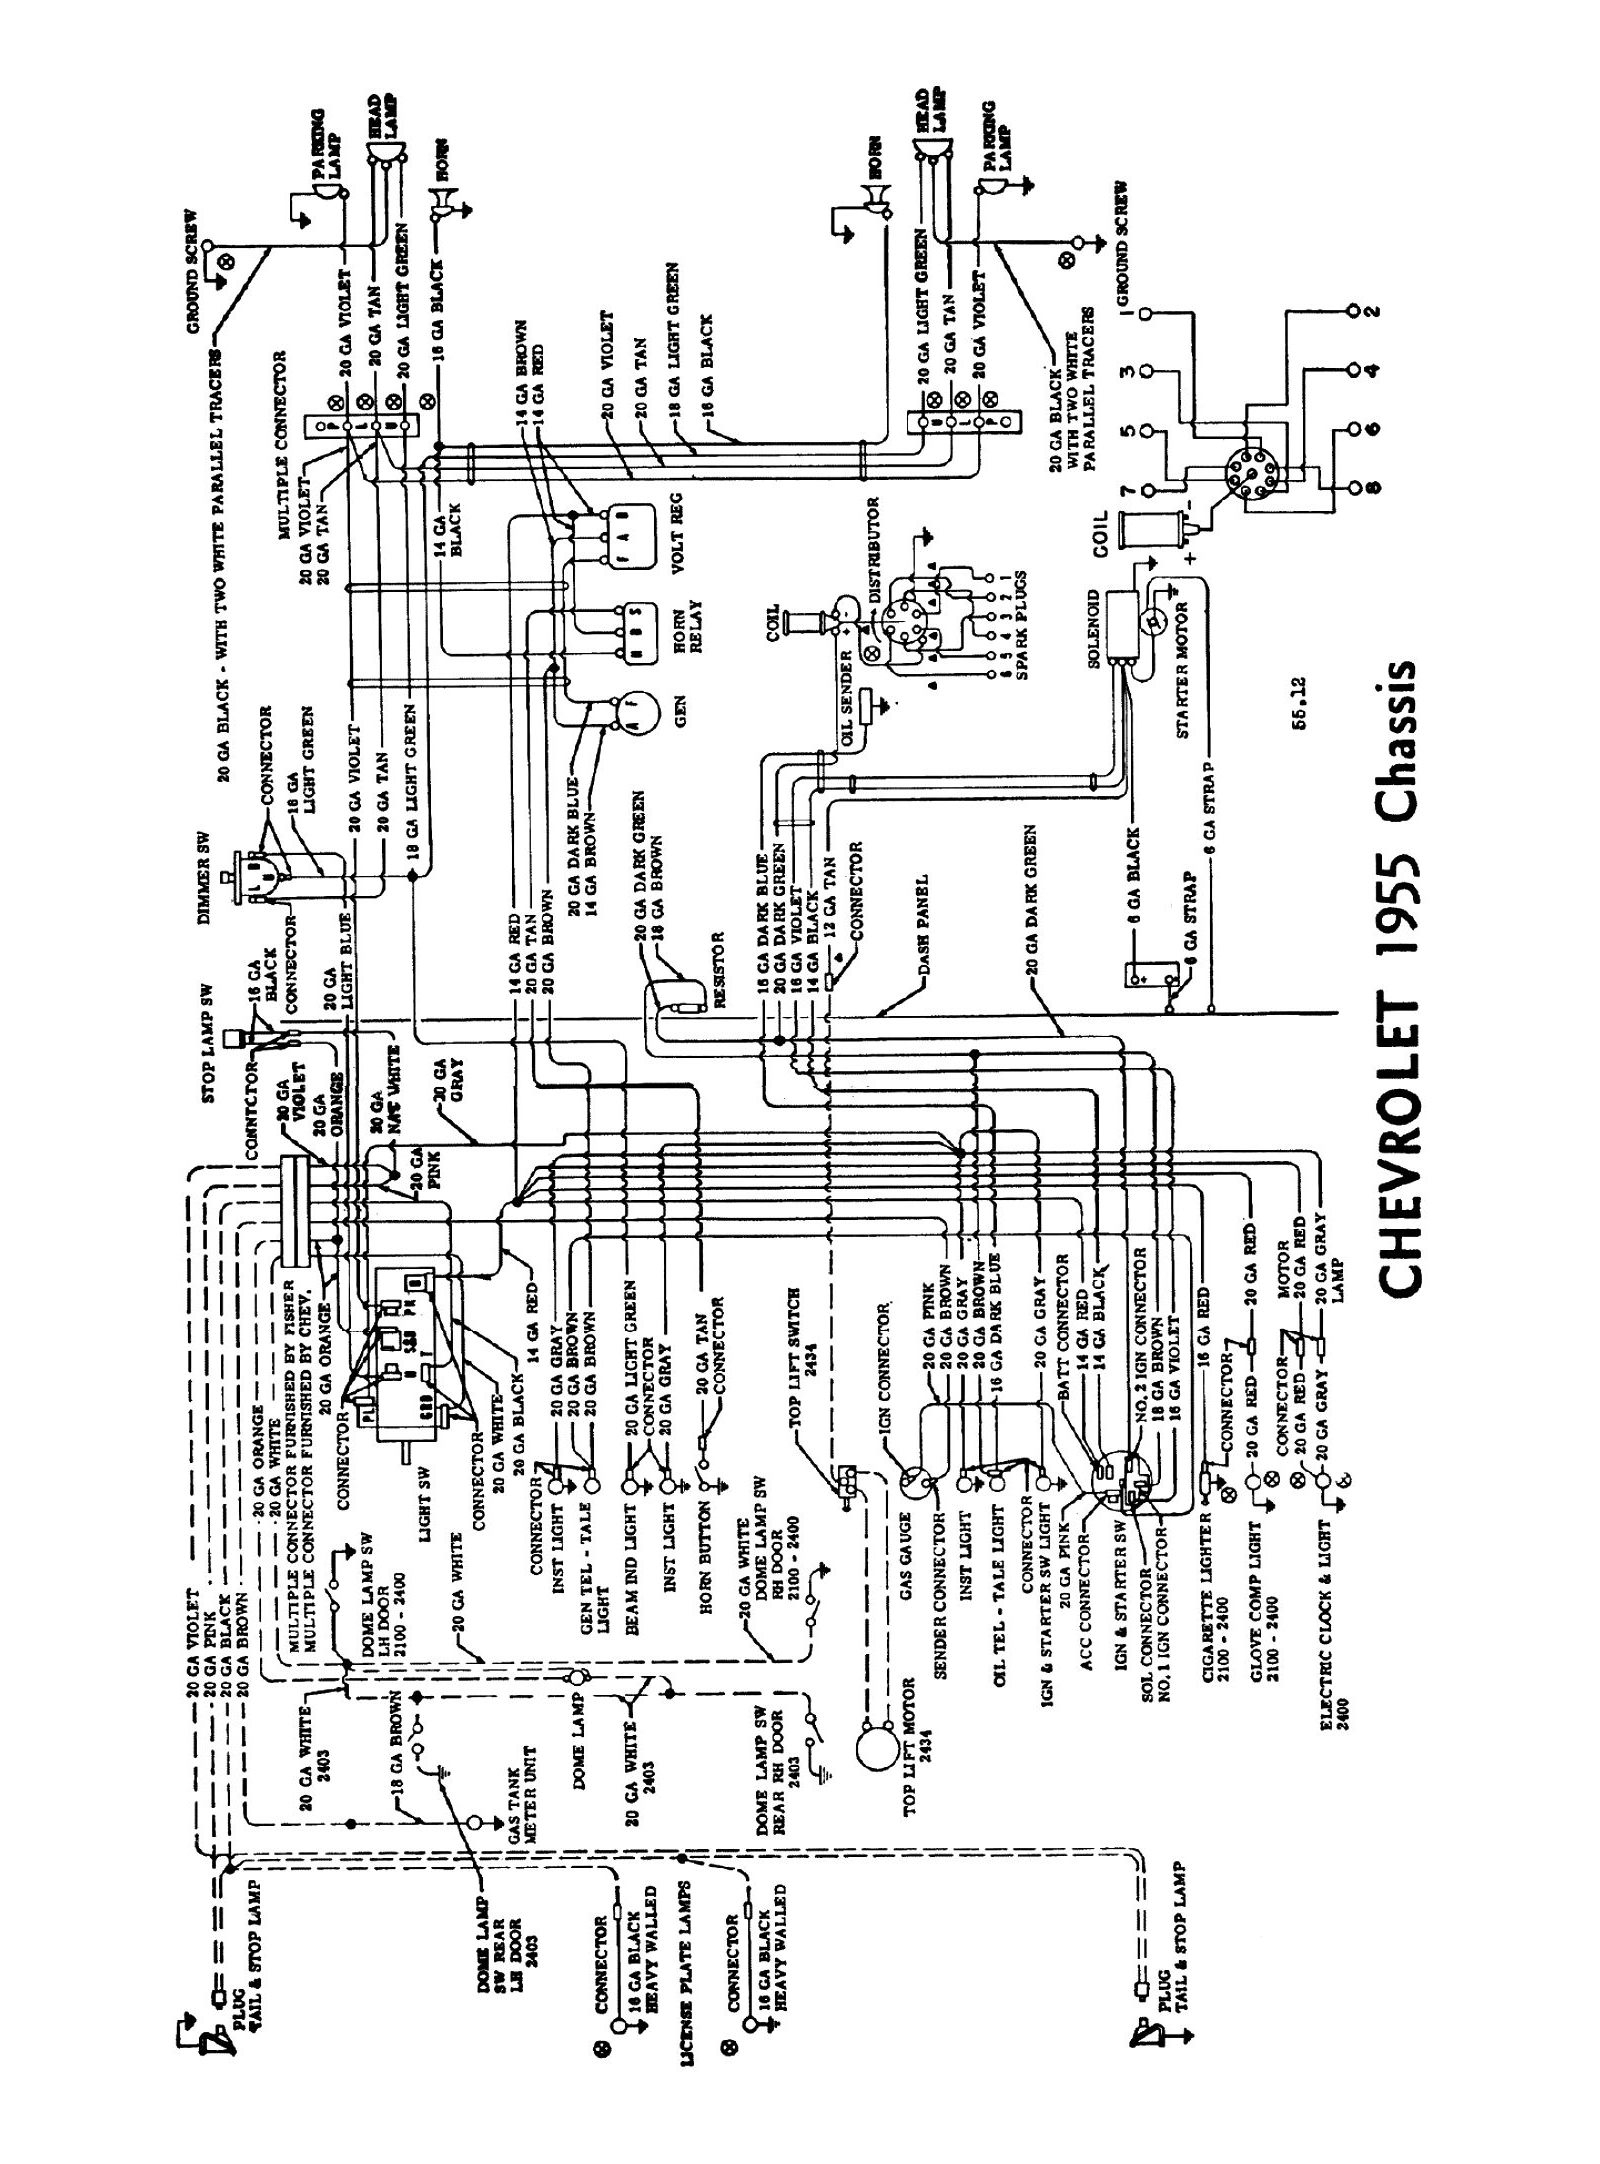 Fuel Sending Unit Wiring Diagram Manual E Books